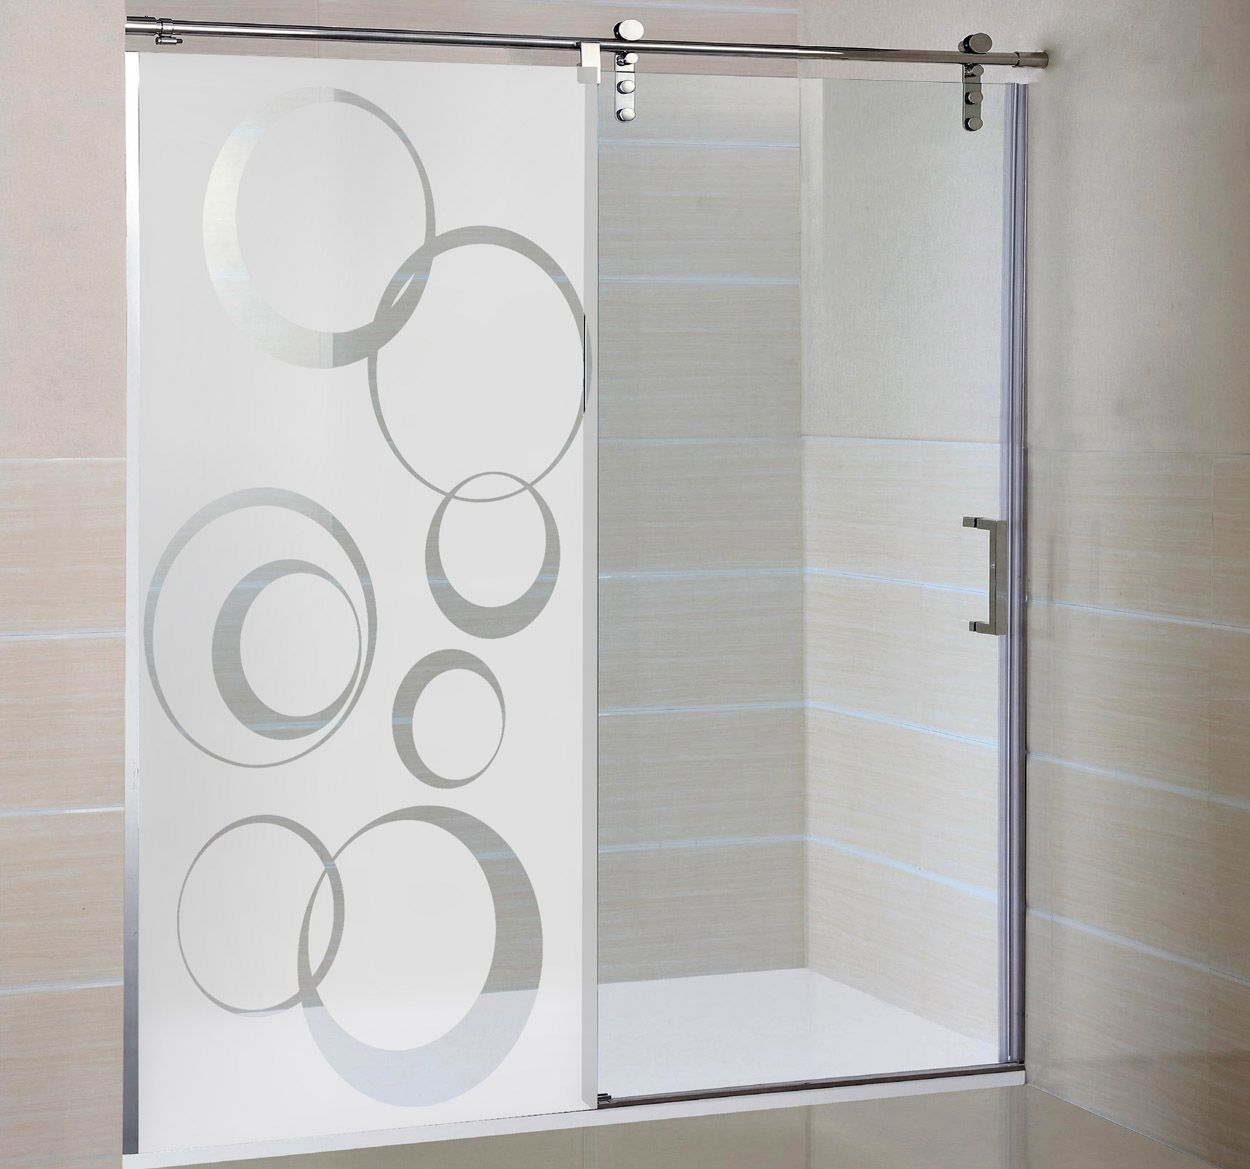 Vinilo decorativo mampara c rculos vinilos ducha - Vinilo para vidrios ...